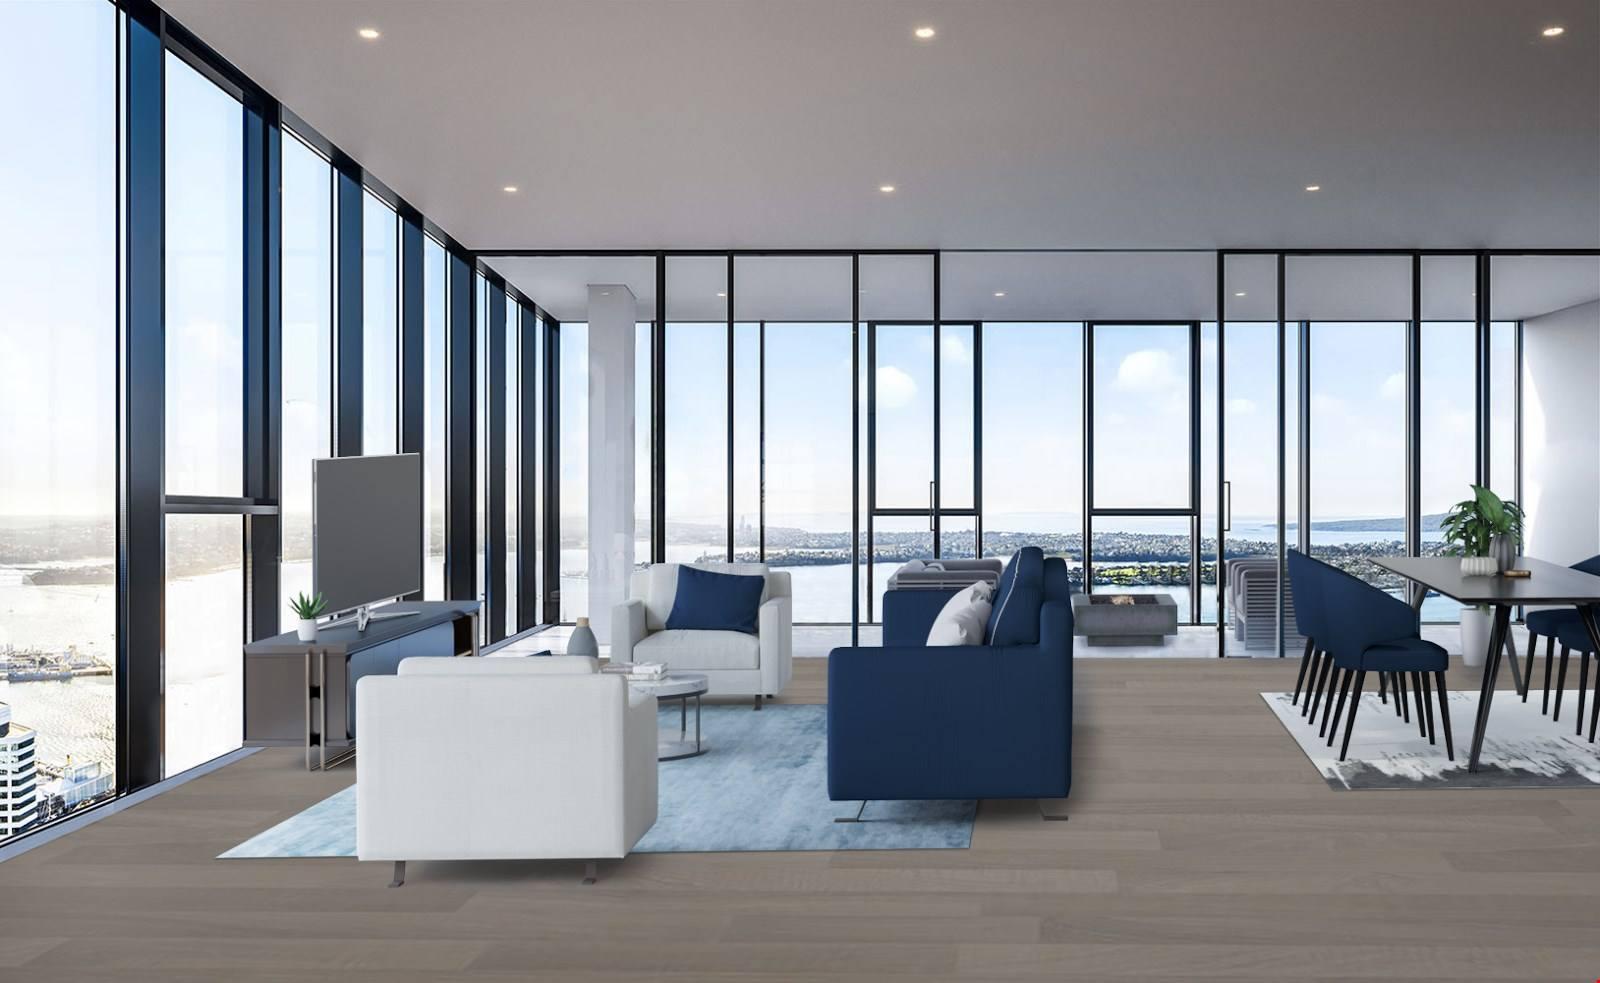 Auckland Central 2房 急售!49楼云巅美寓 大师之作 四面八方皆是景 给您世界级非凡享受! Urgent Sale! Spectacular home in World Class B...